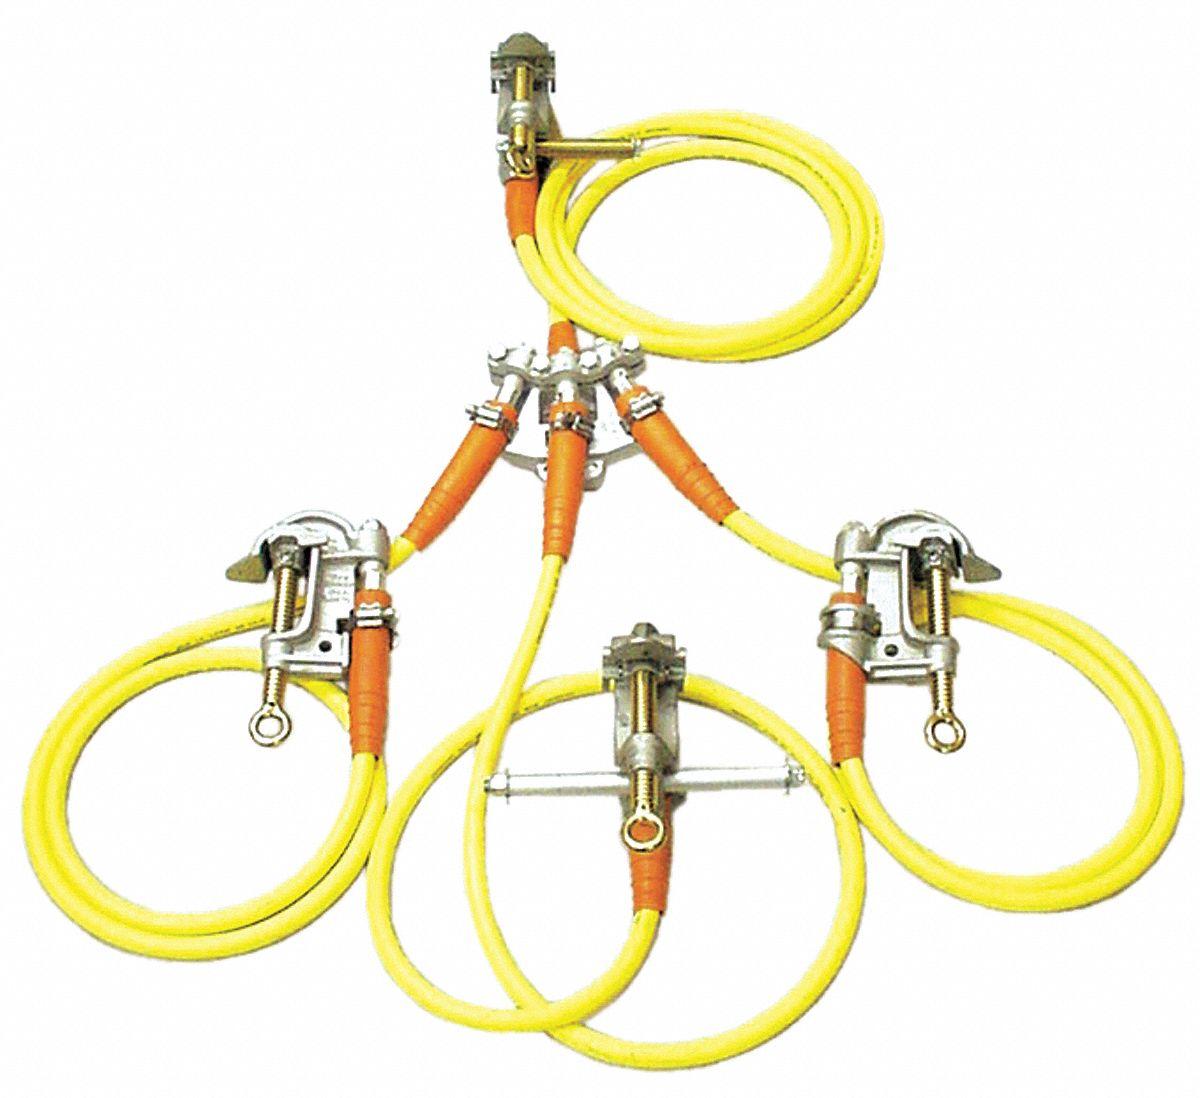 High Voltage Grounding Stick : Salisbury four way grounding set kuy grainger